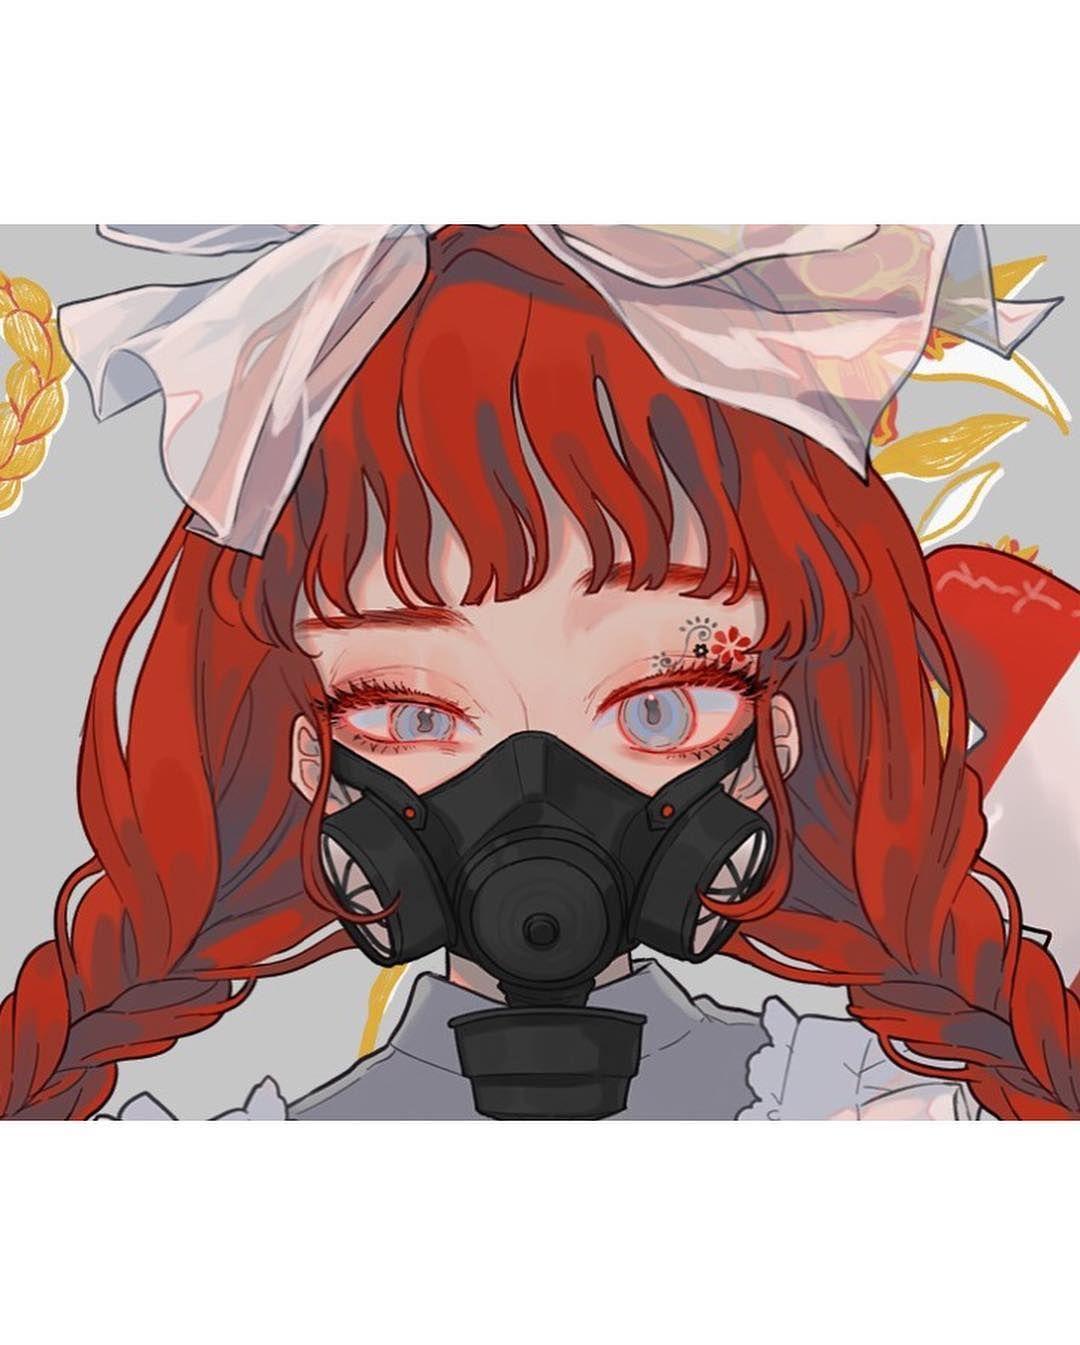 Pin by Noname on โปรเจกต์น่าลอง Cute anime character